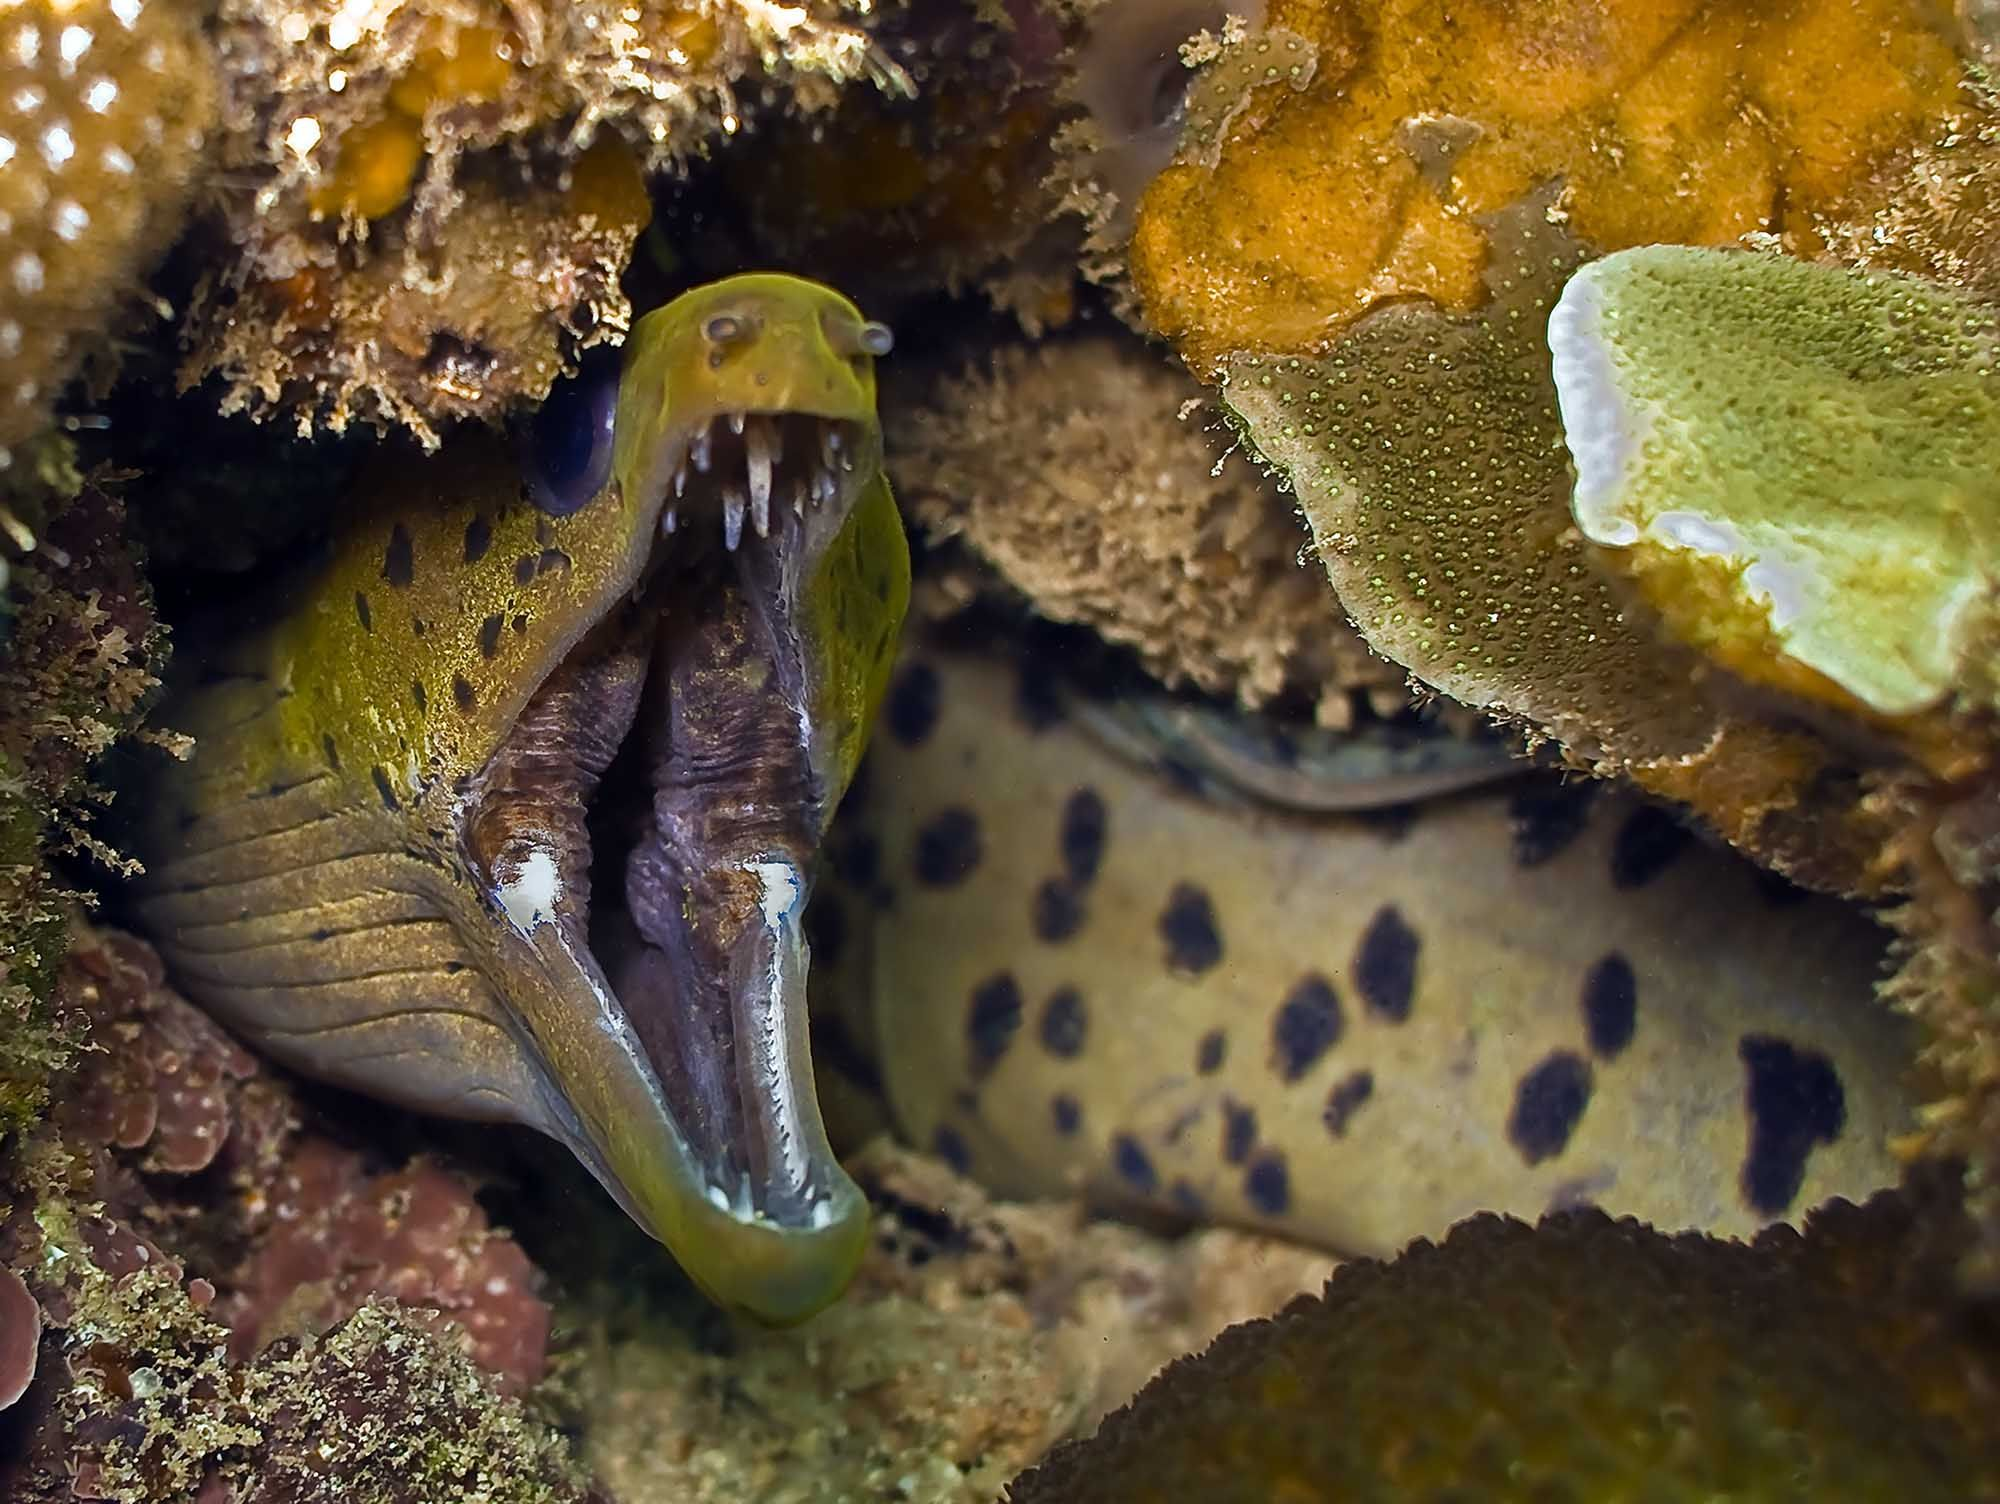 moray eel madang ples bilong mi fish pinterest wildlife